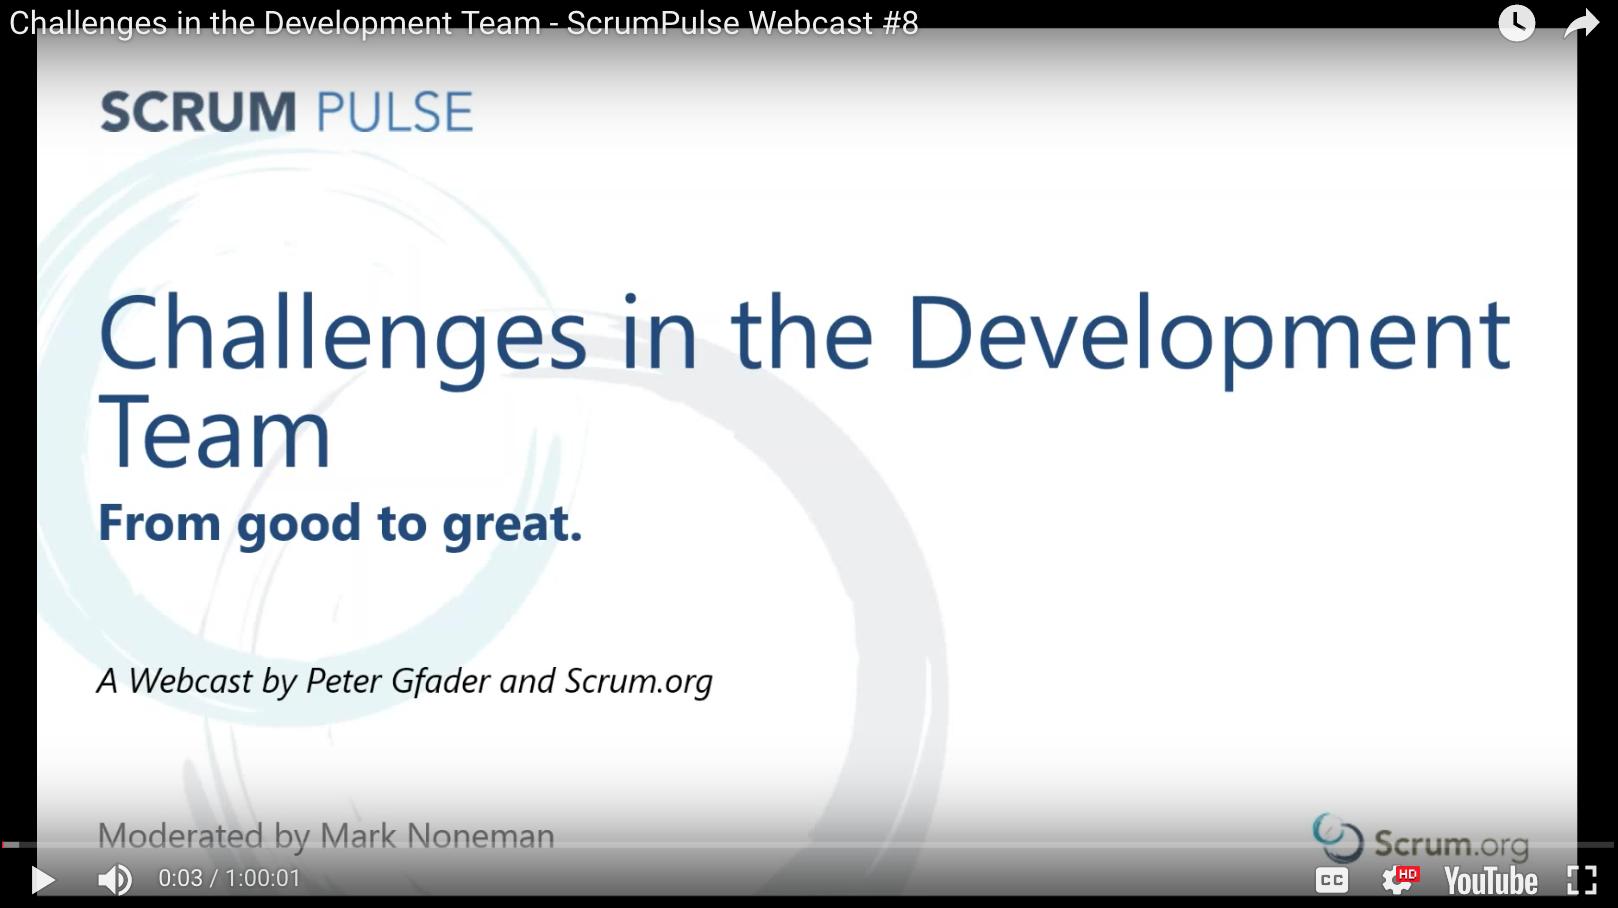 Challenges in the Development Team